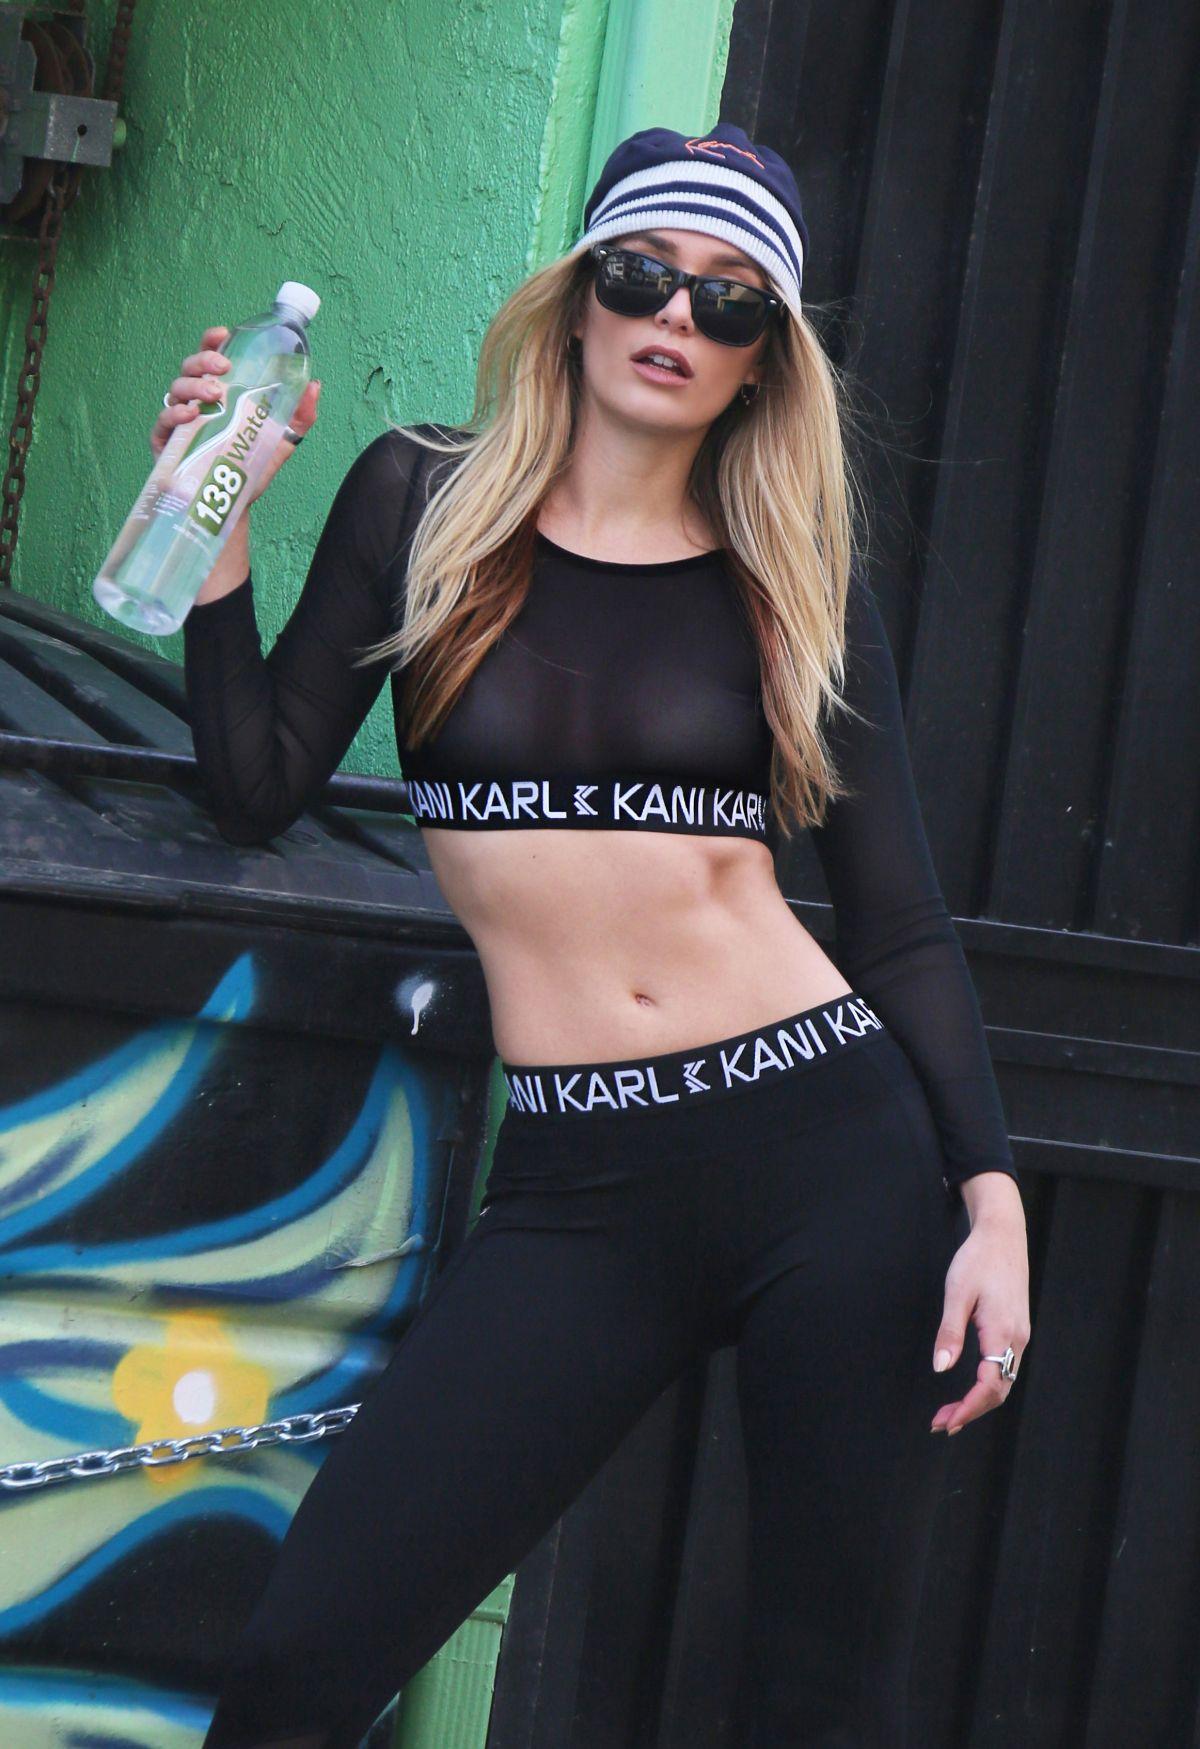 Sofia Vespe